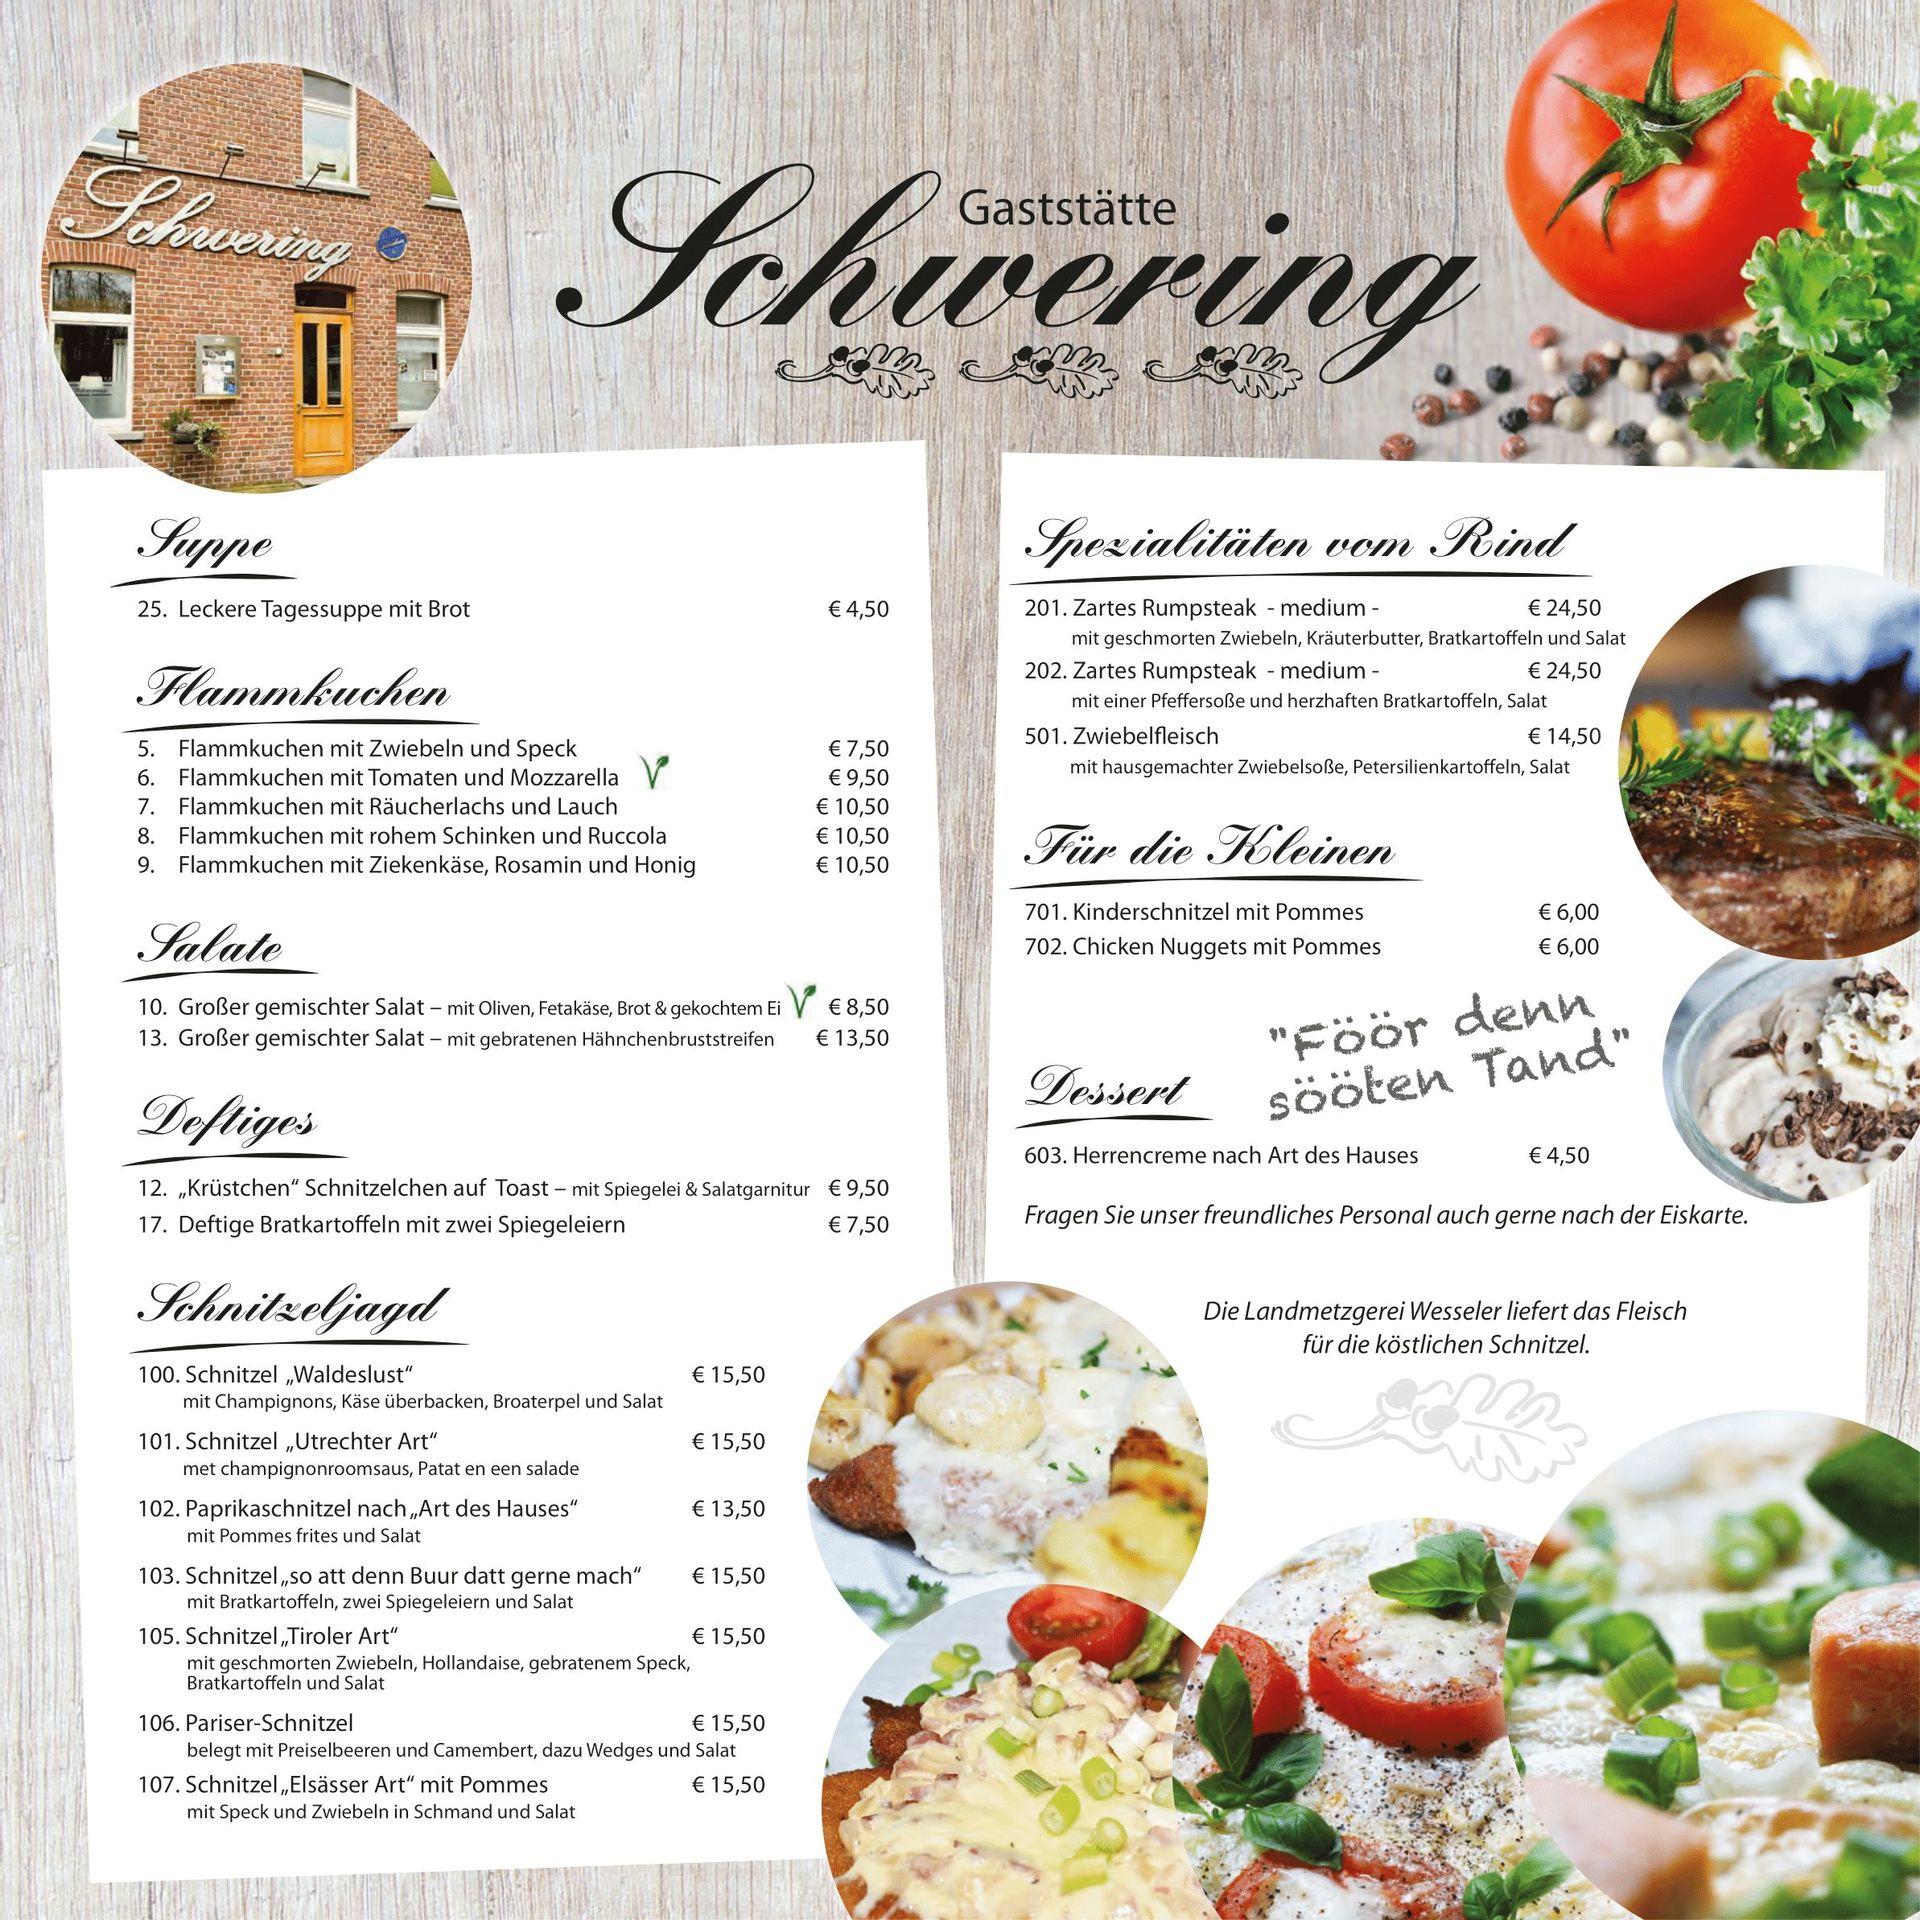 Speisekarte | Gaststätte Schwering